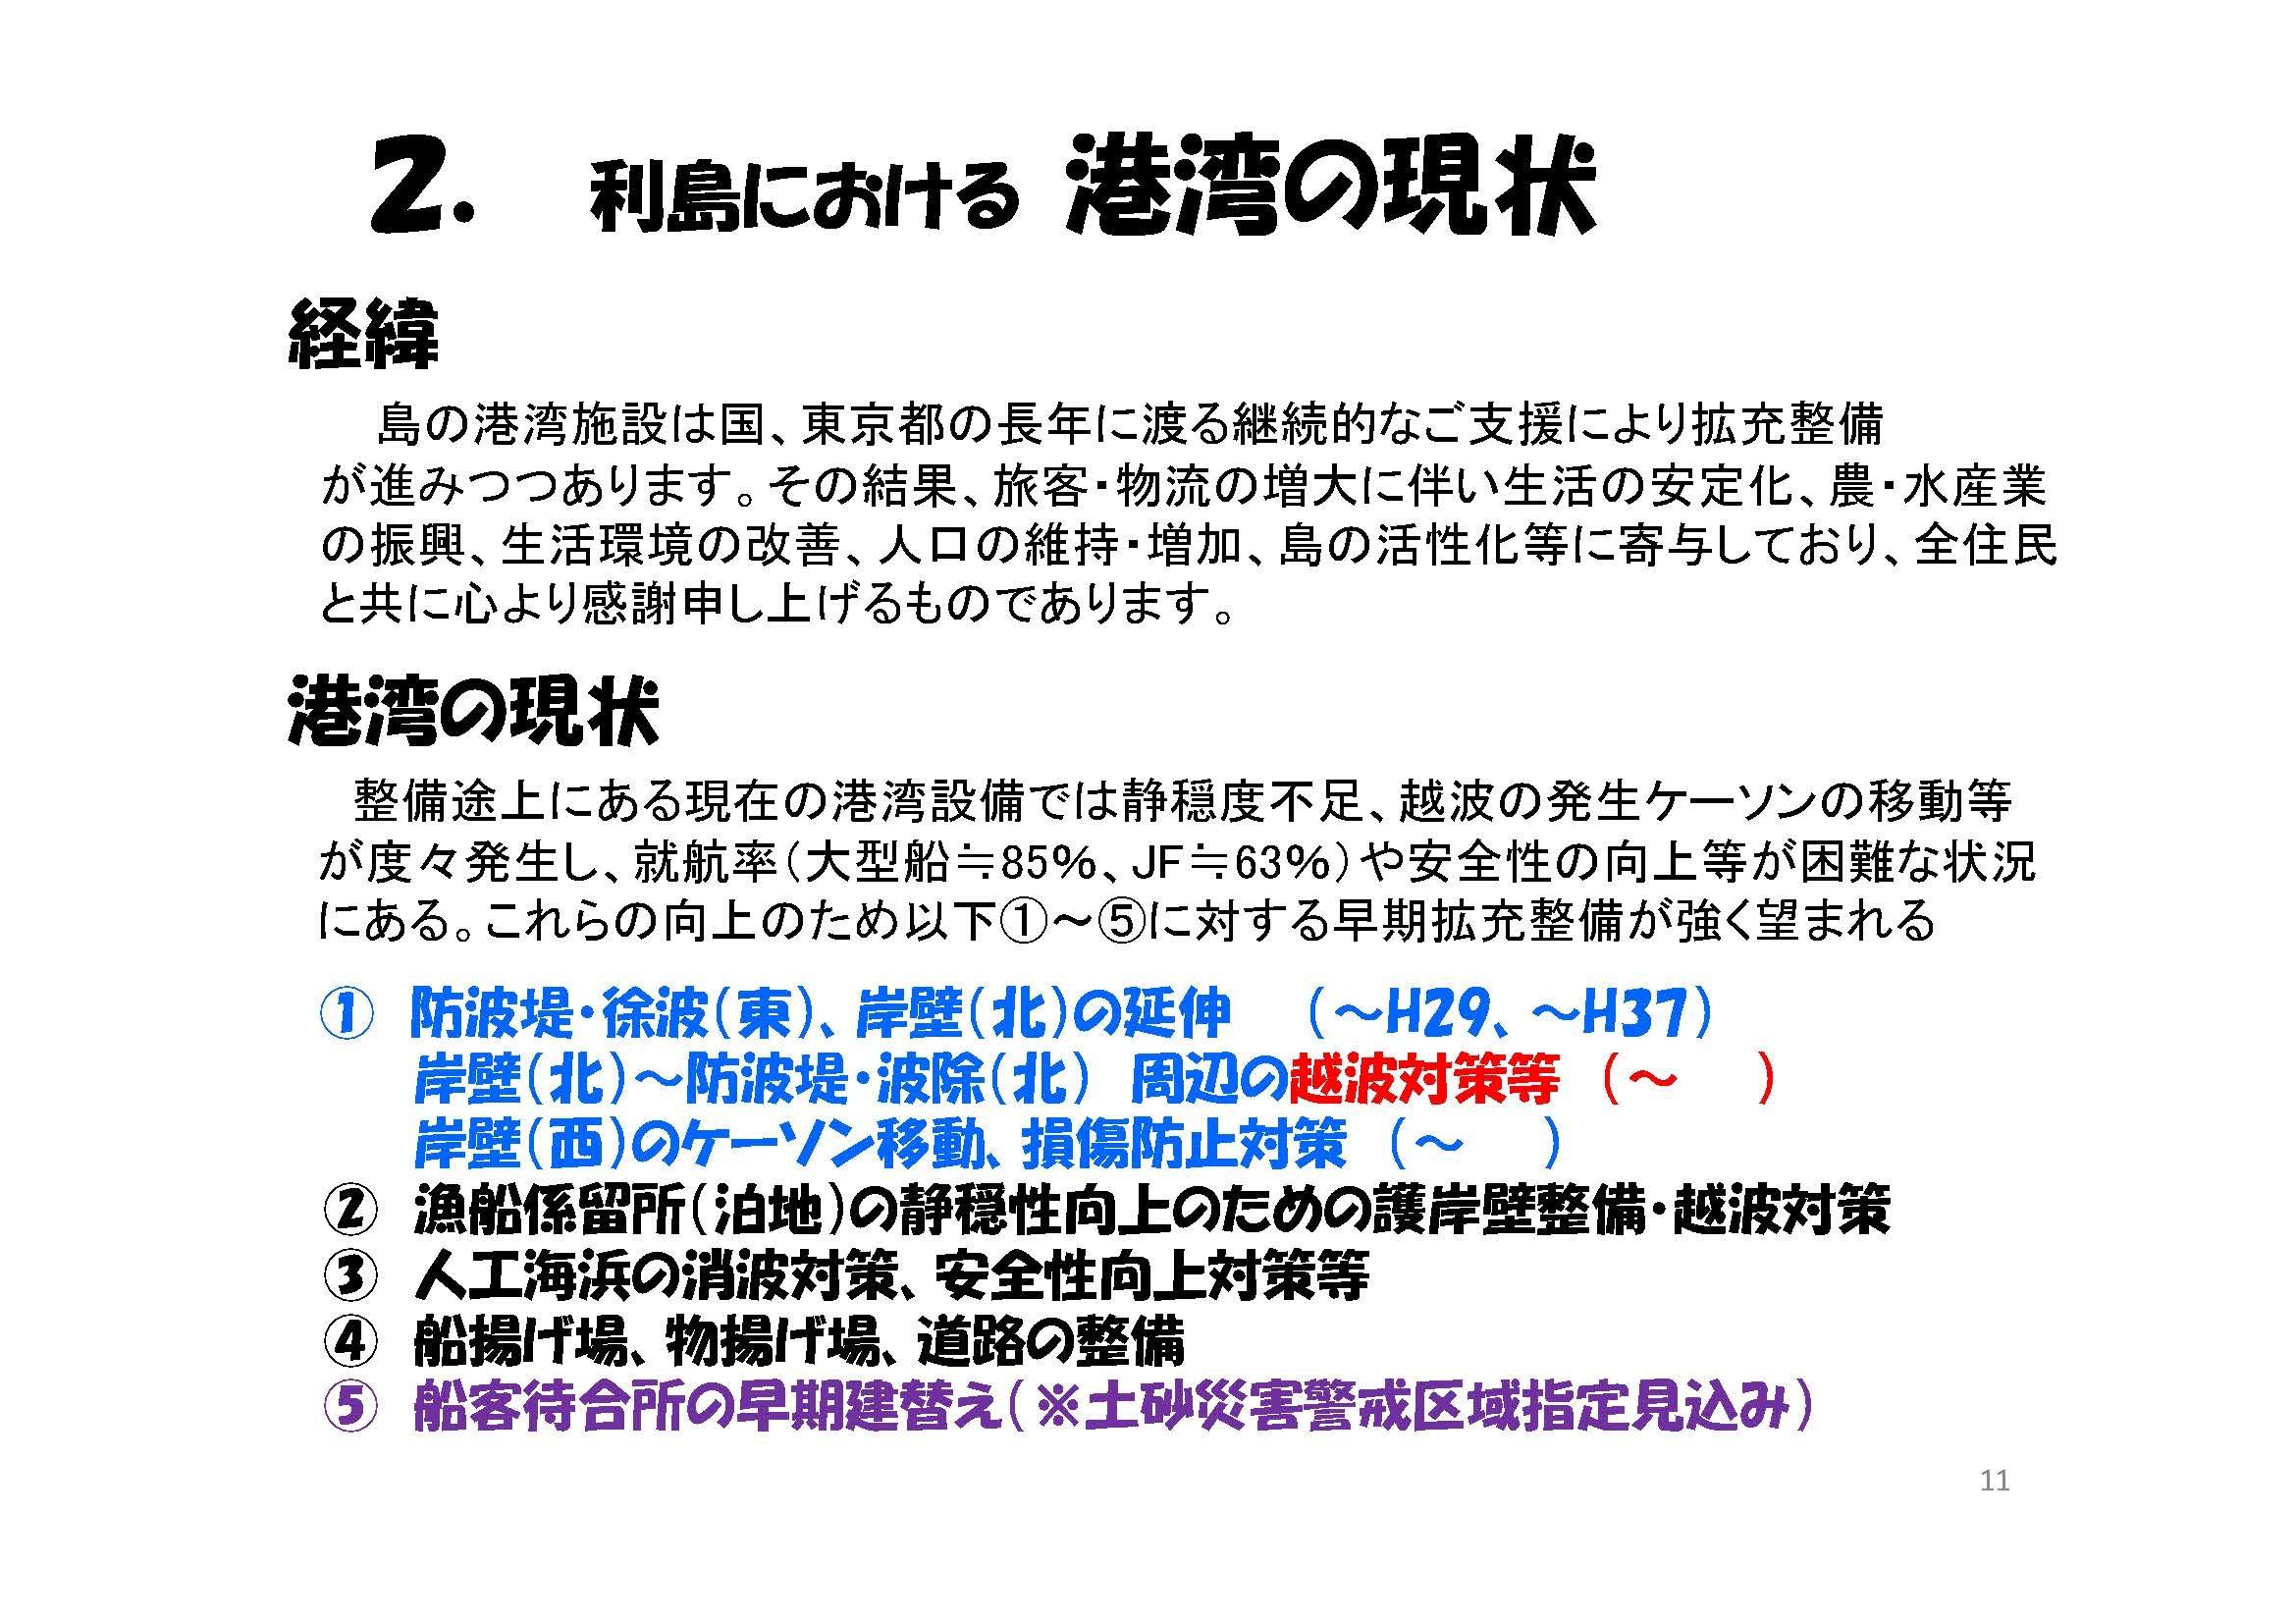 20161101国交省副局長 視察説明資料 プレゼン用01